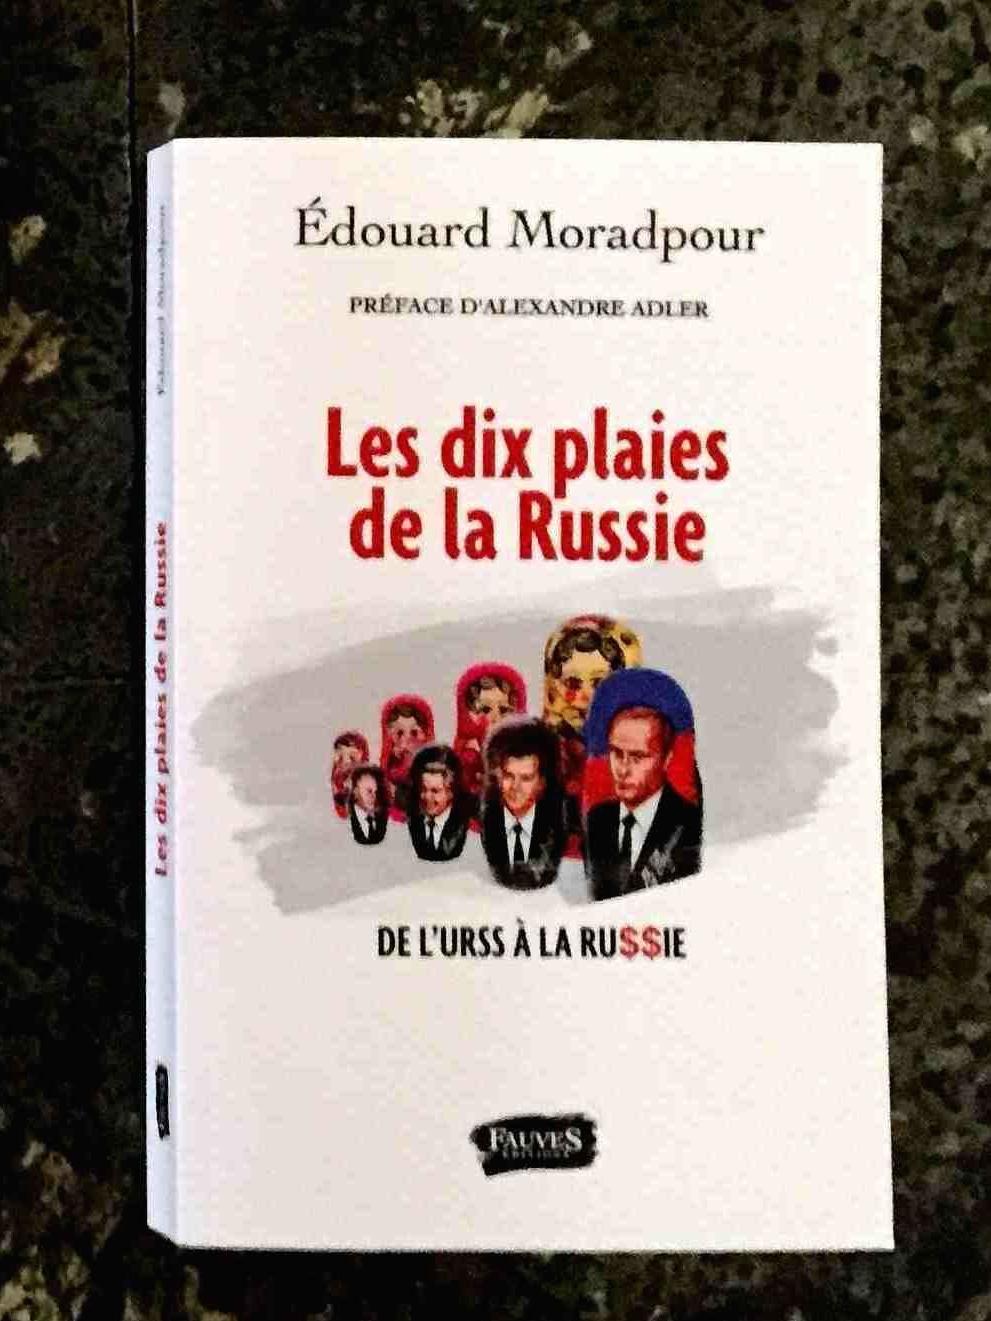 edouard-m-livre